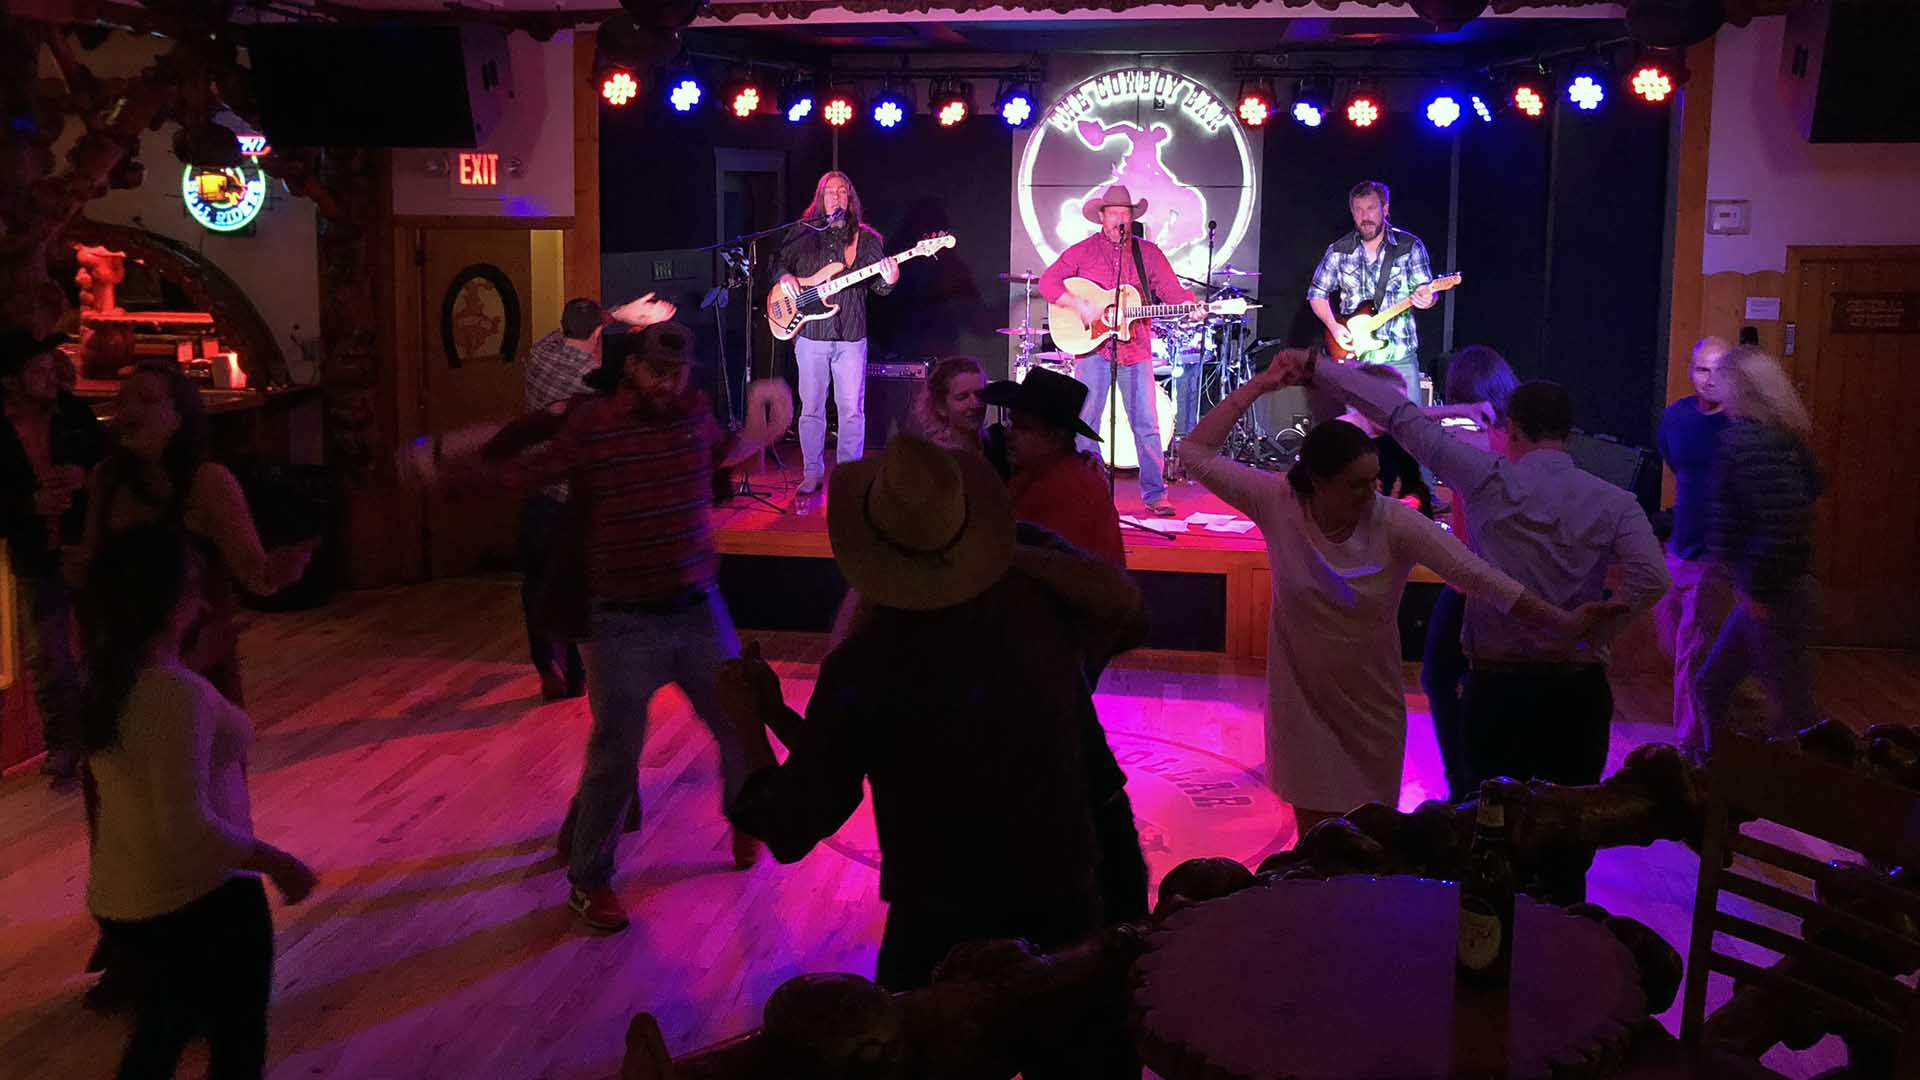 Million Dollar Cowboy Bar - Jackson Hole, Wyoming